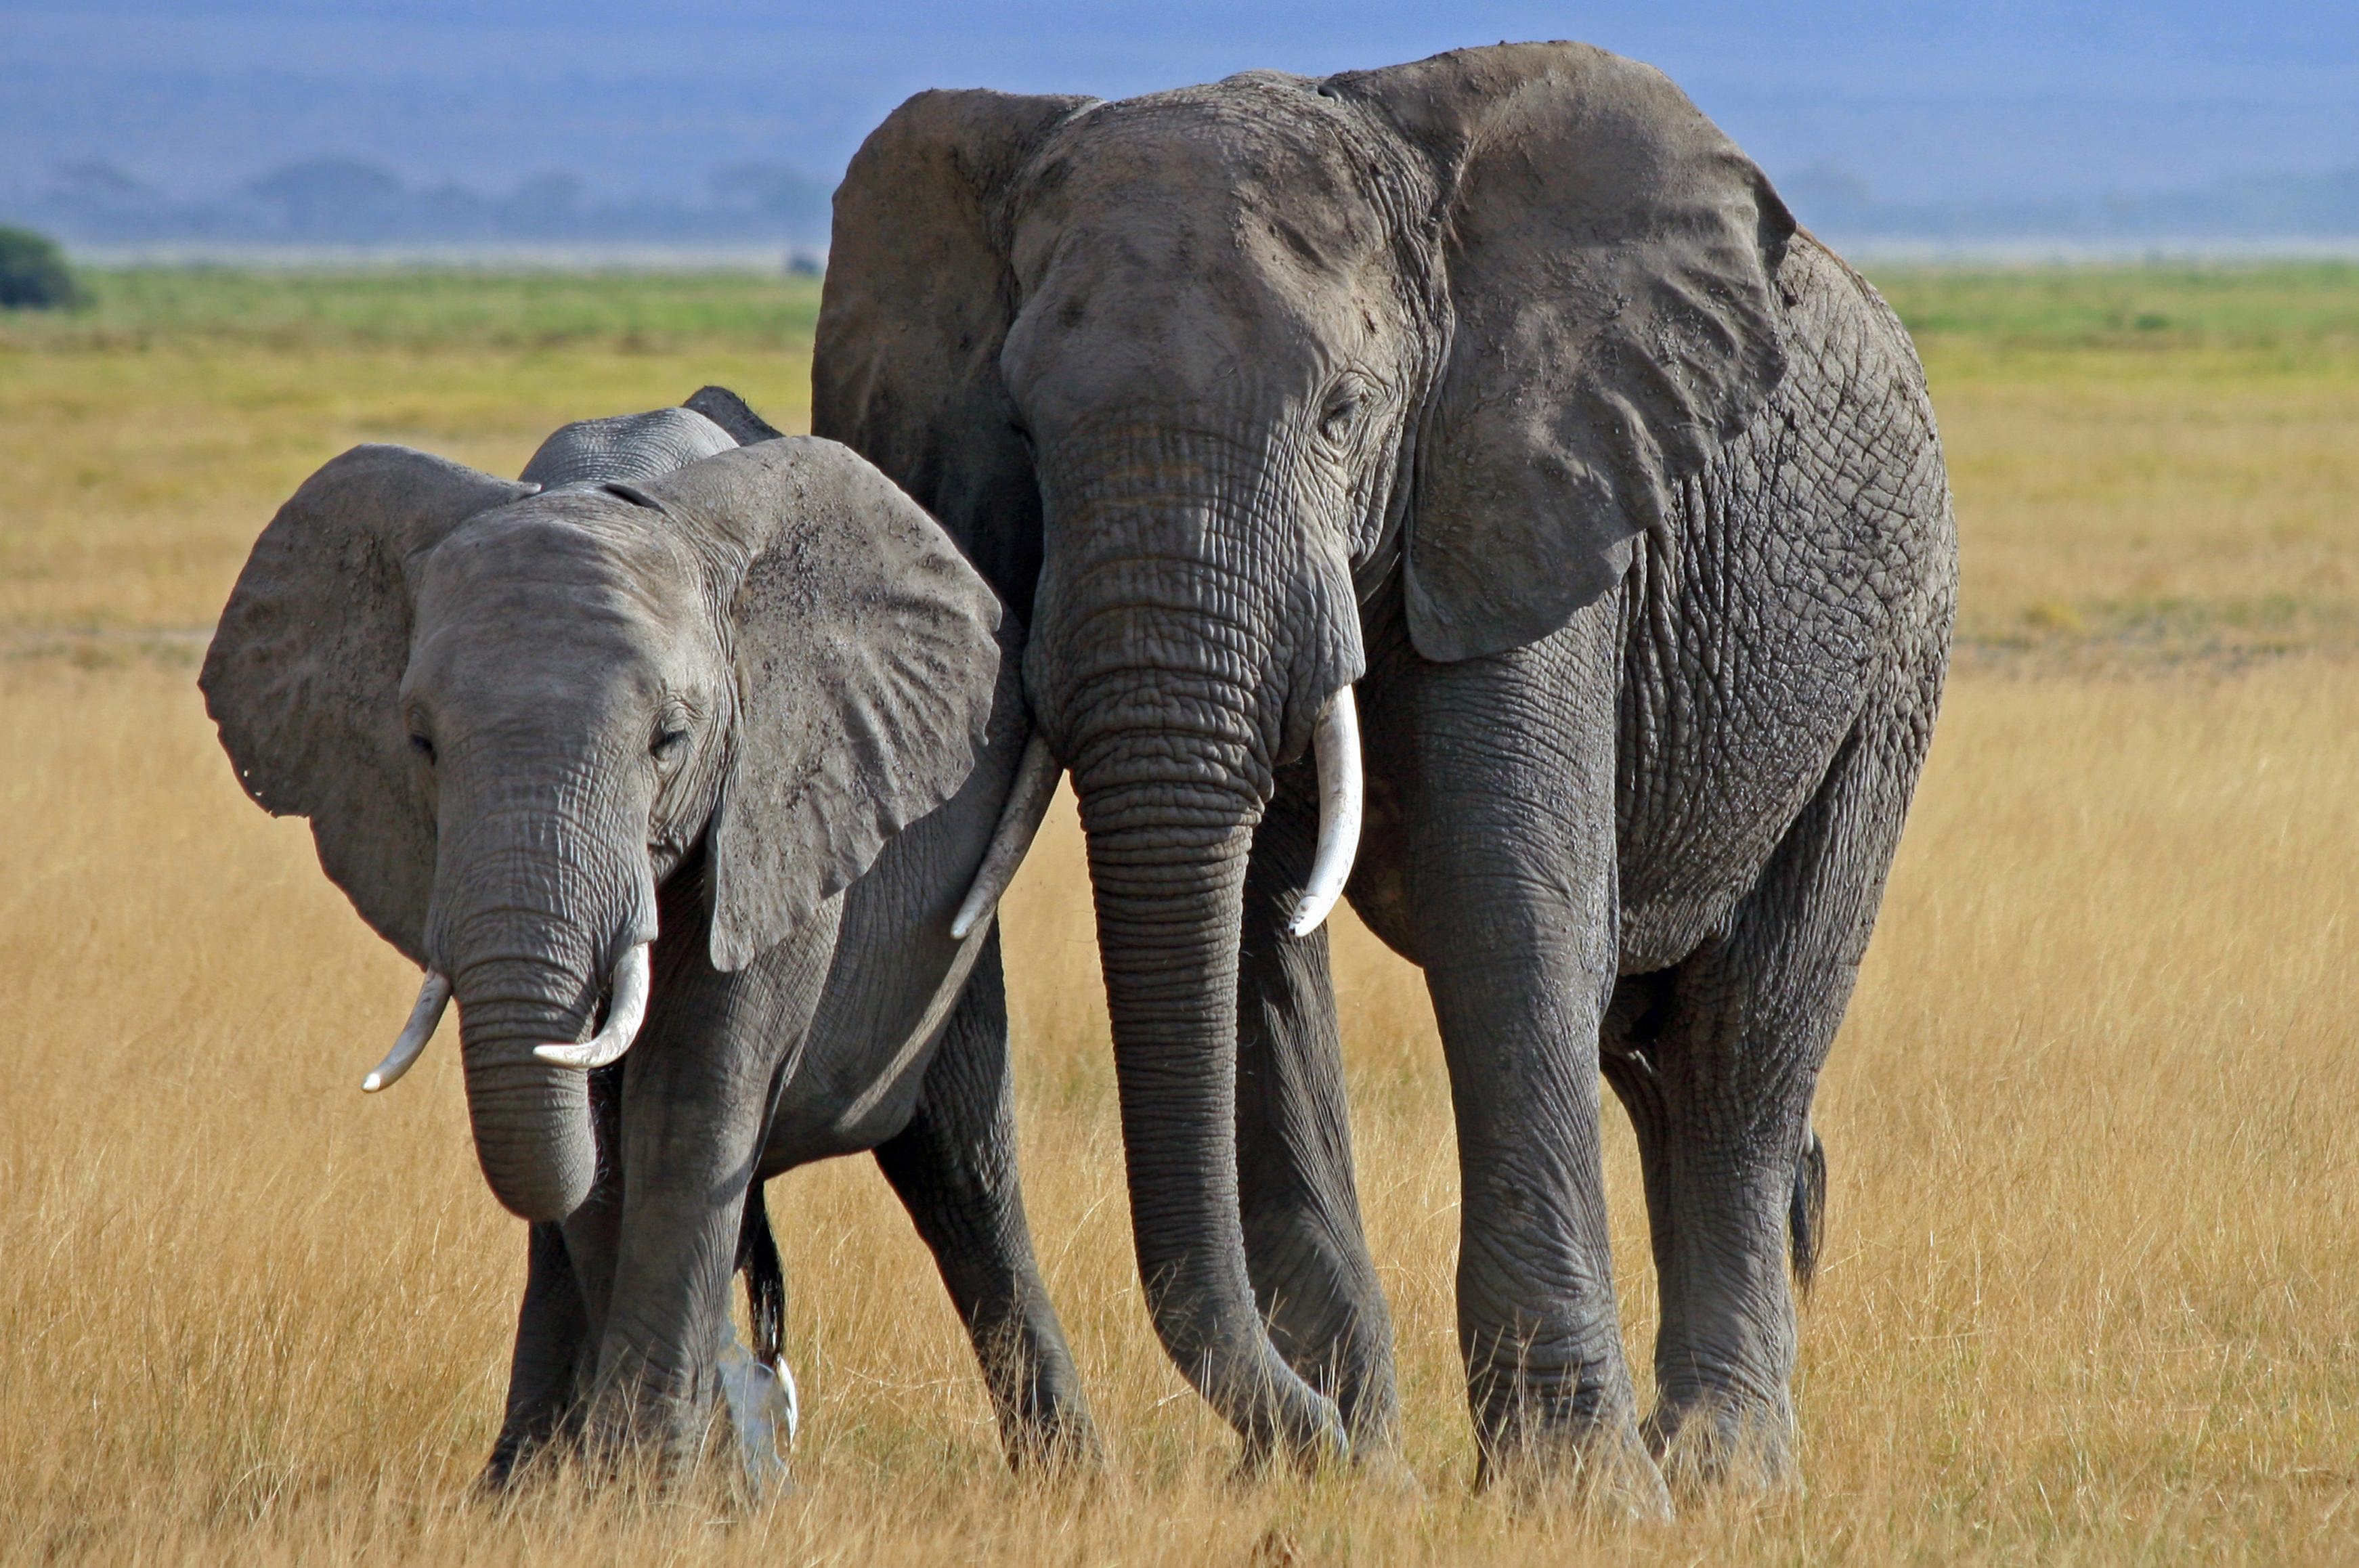 Wallpaper download elephant - Elephant Computer Wallpapers Desktop Backgrounds 3484x2316 Id